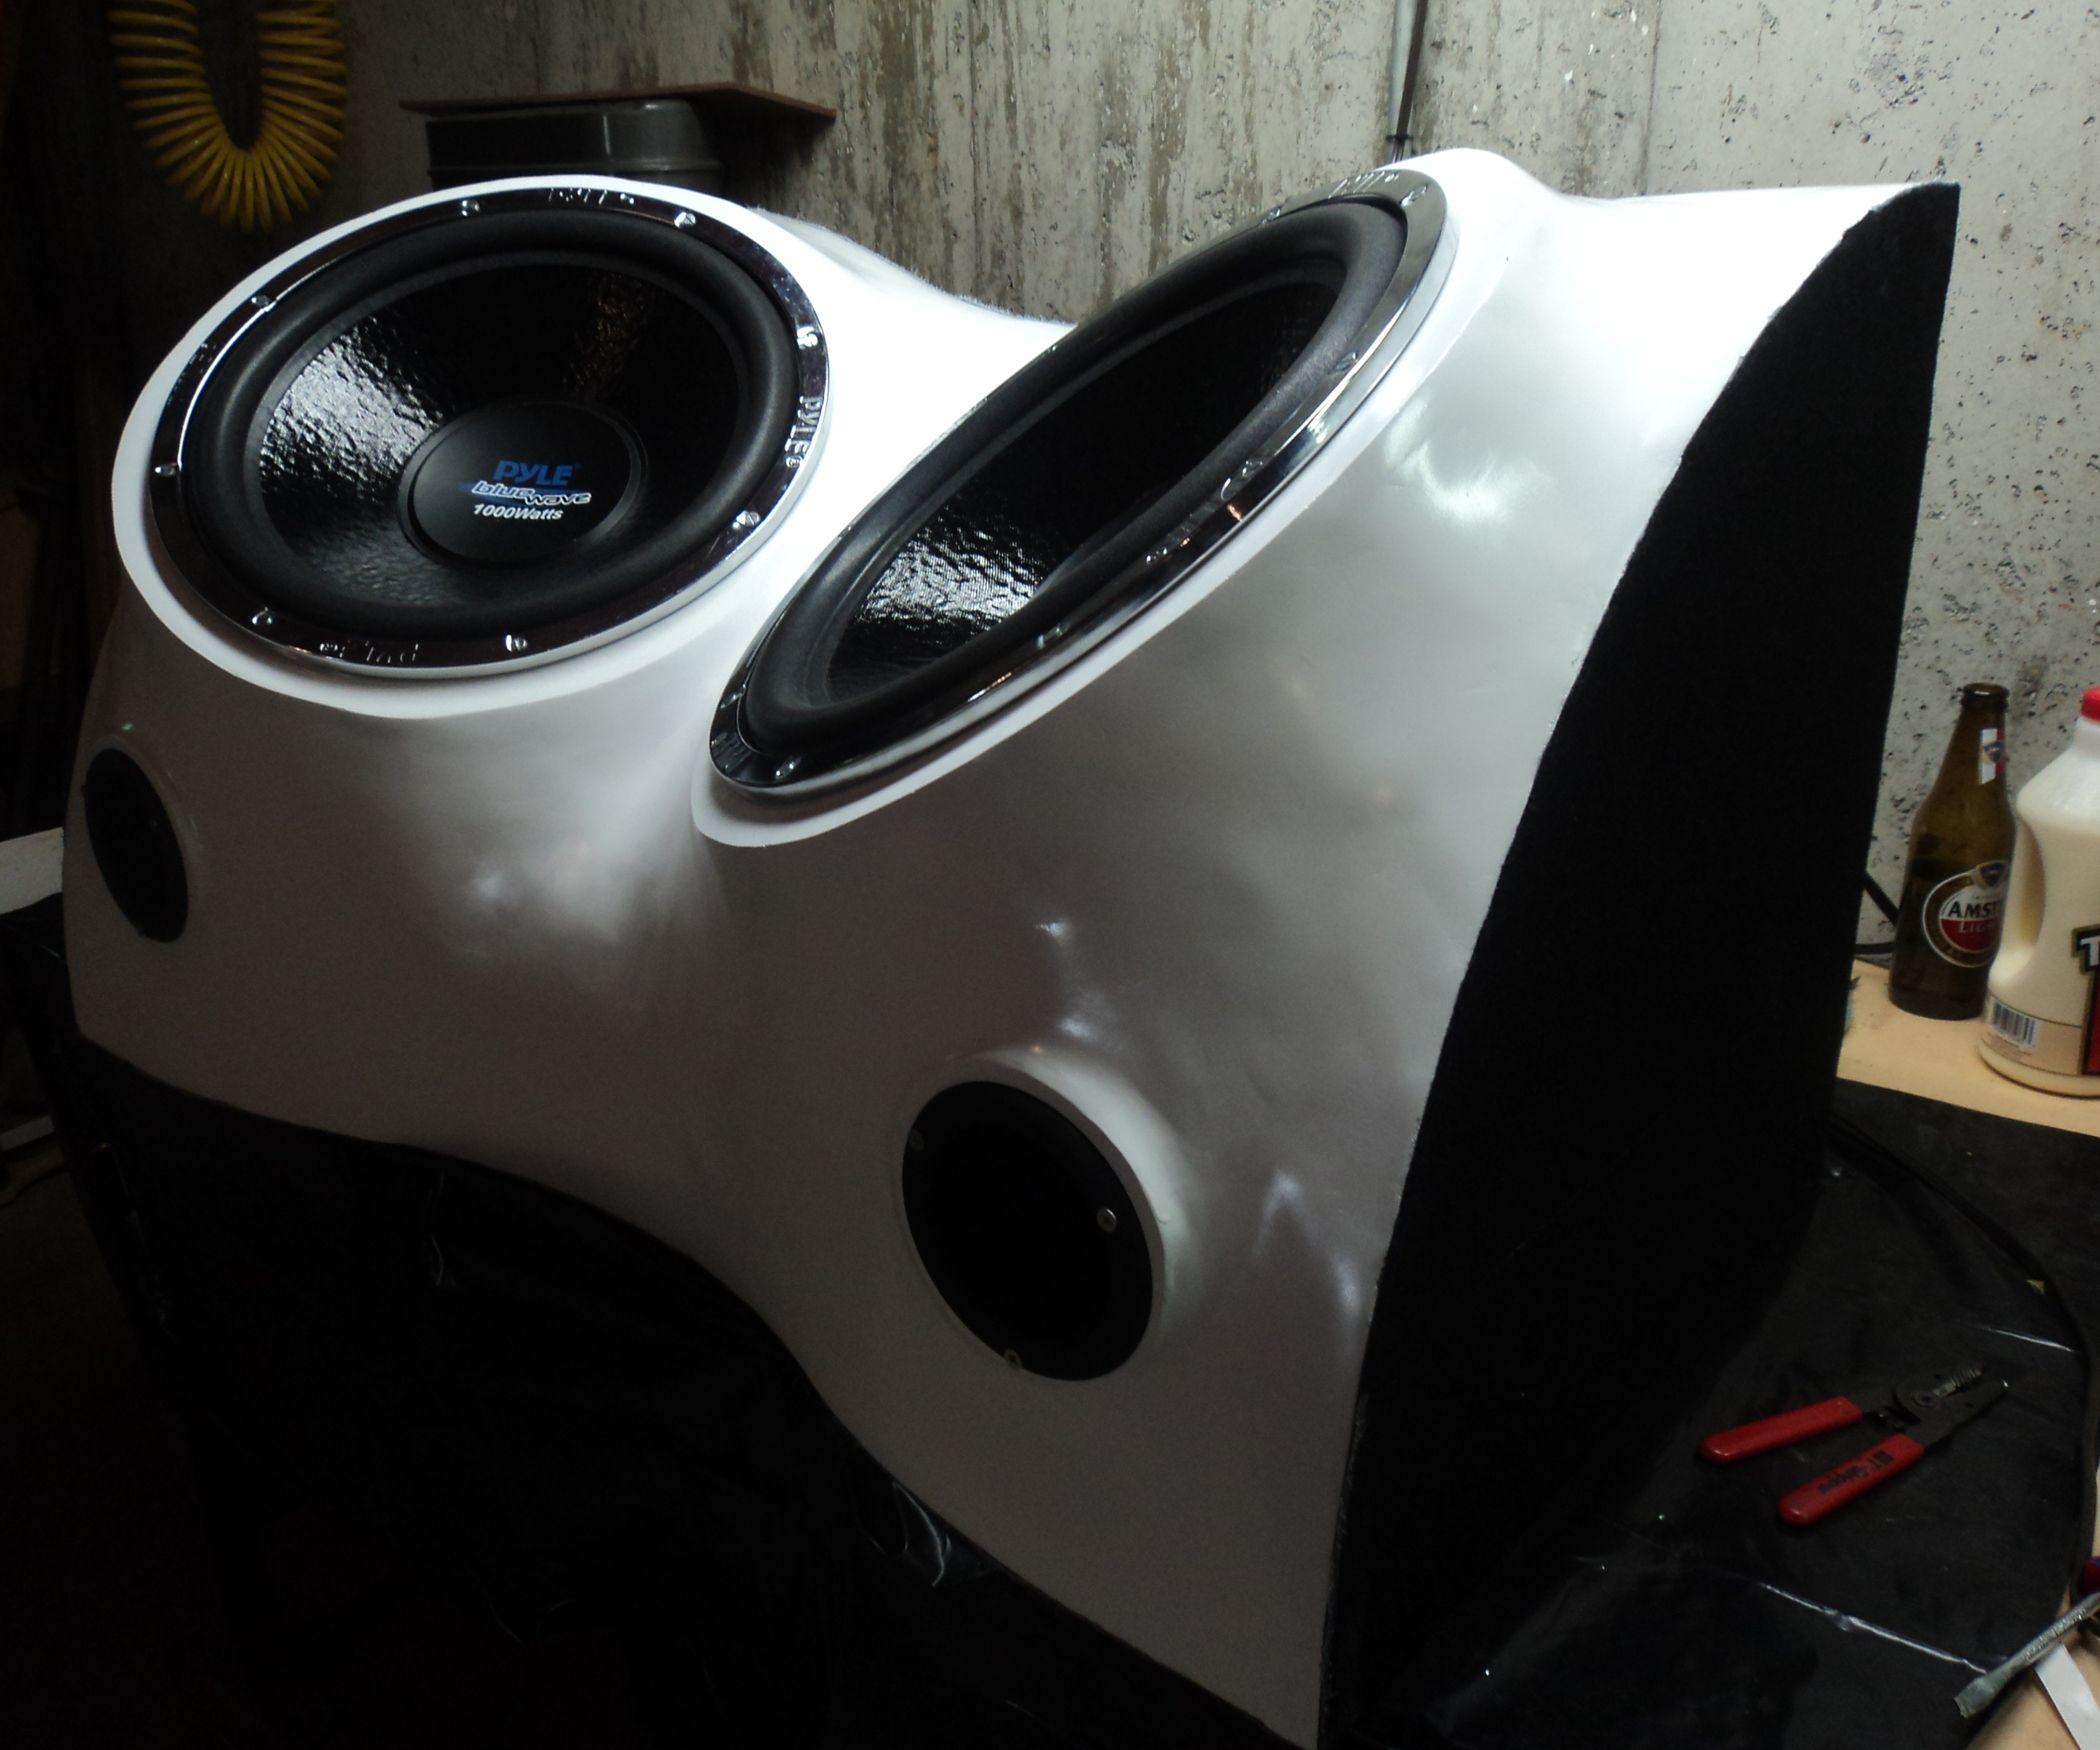 Build a Fiberglass Subwoofer, Start to Finish | Fiberglass